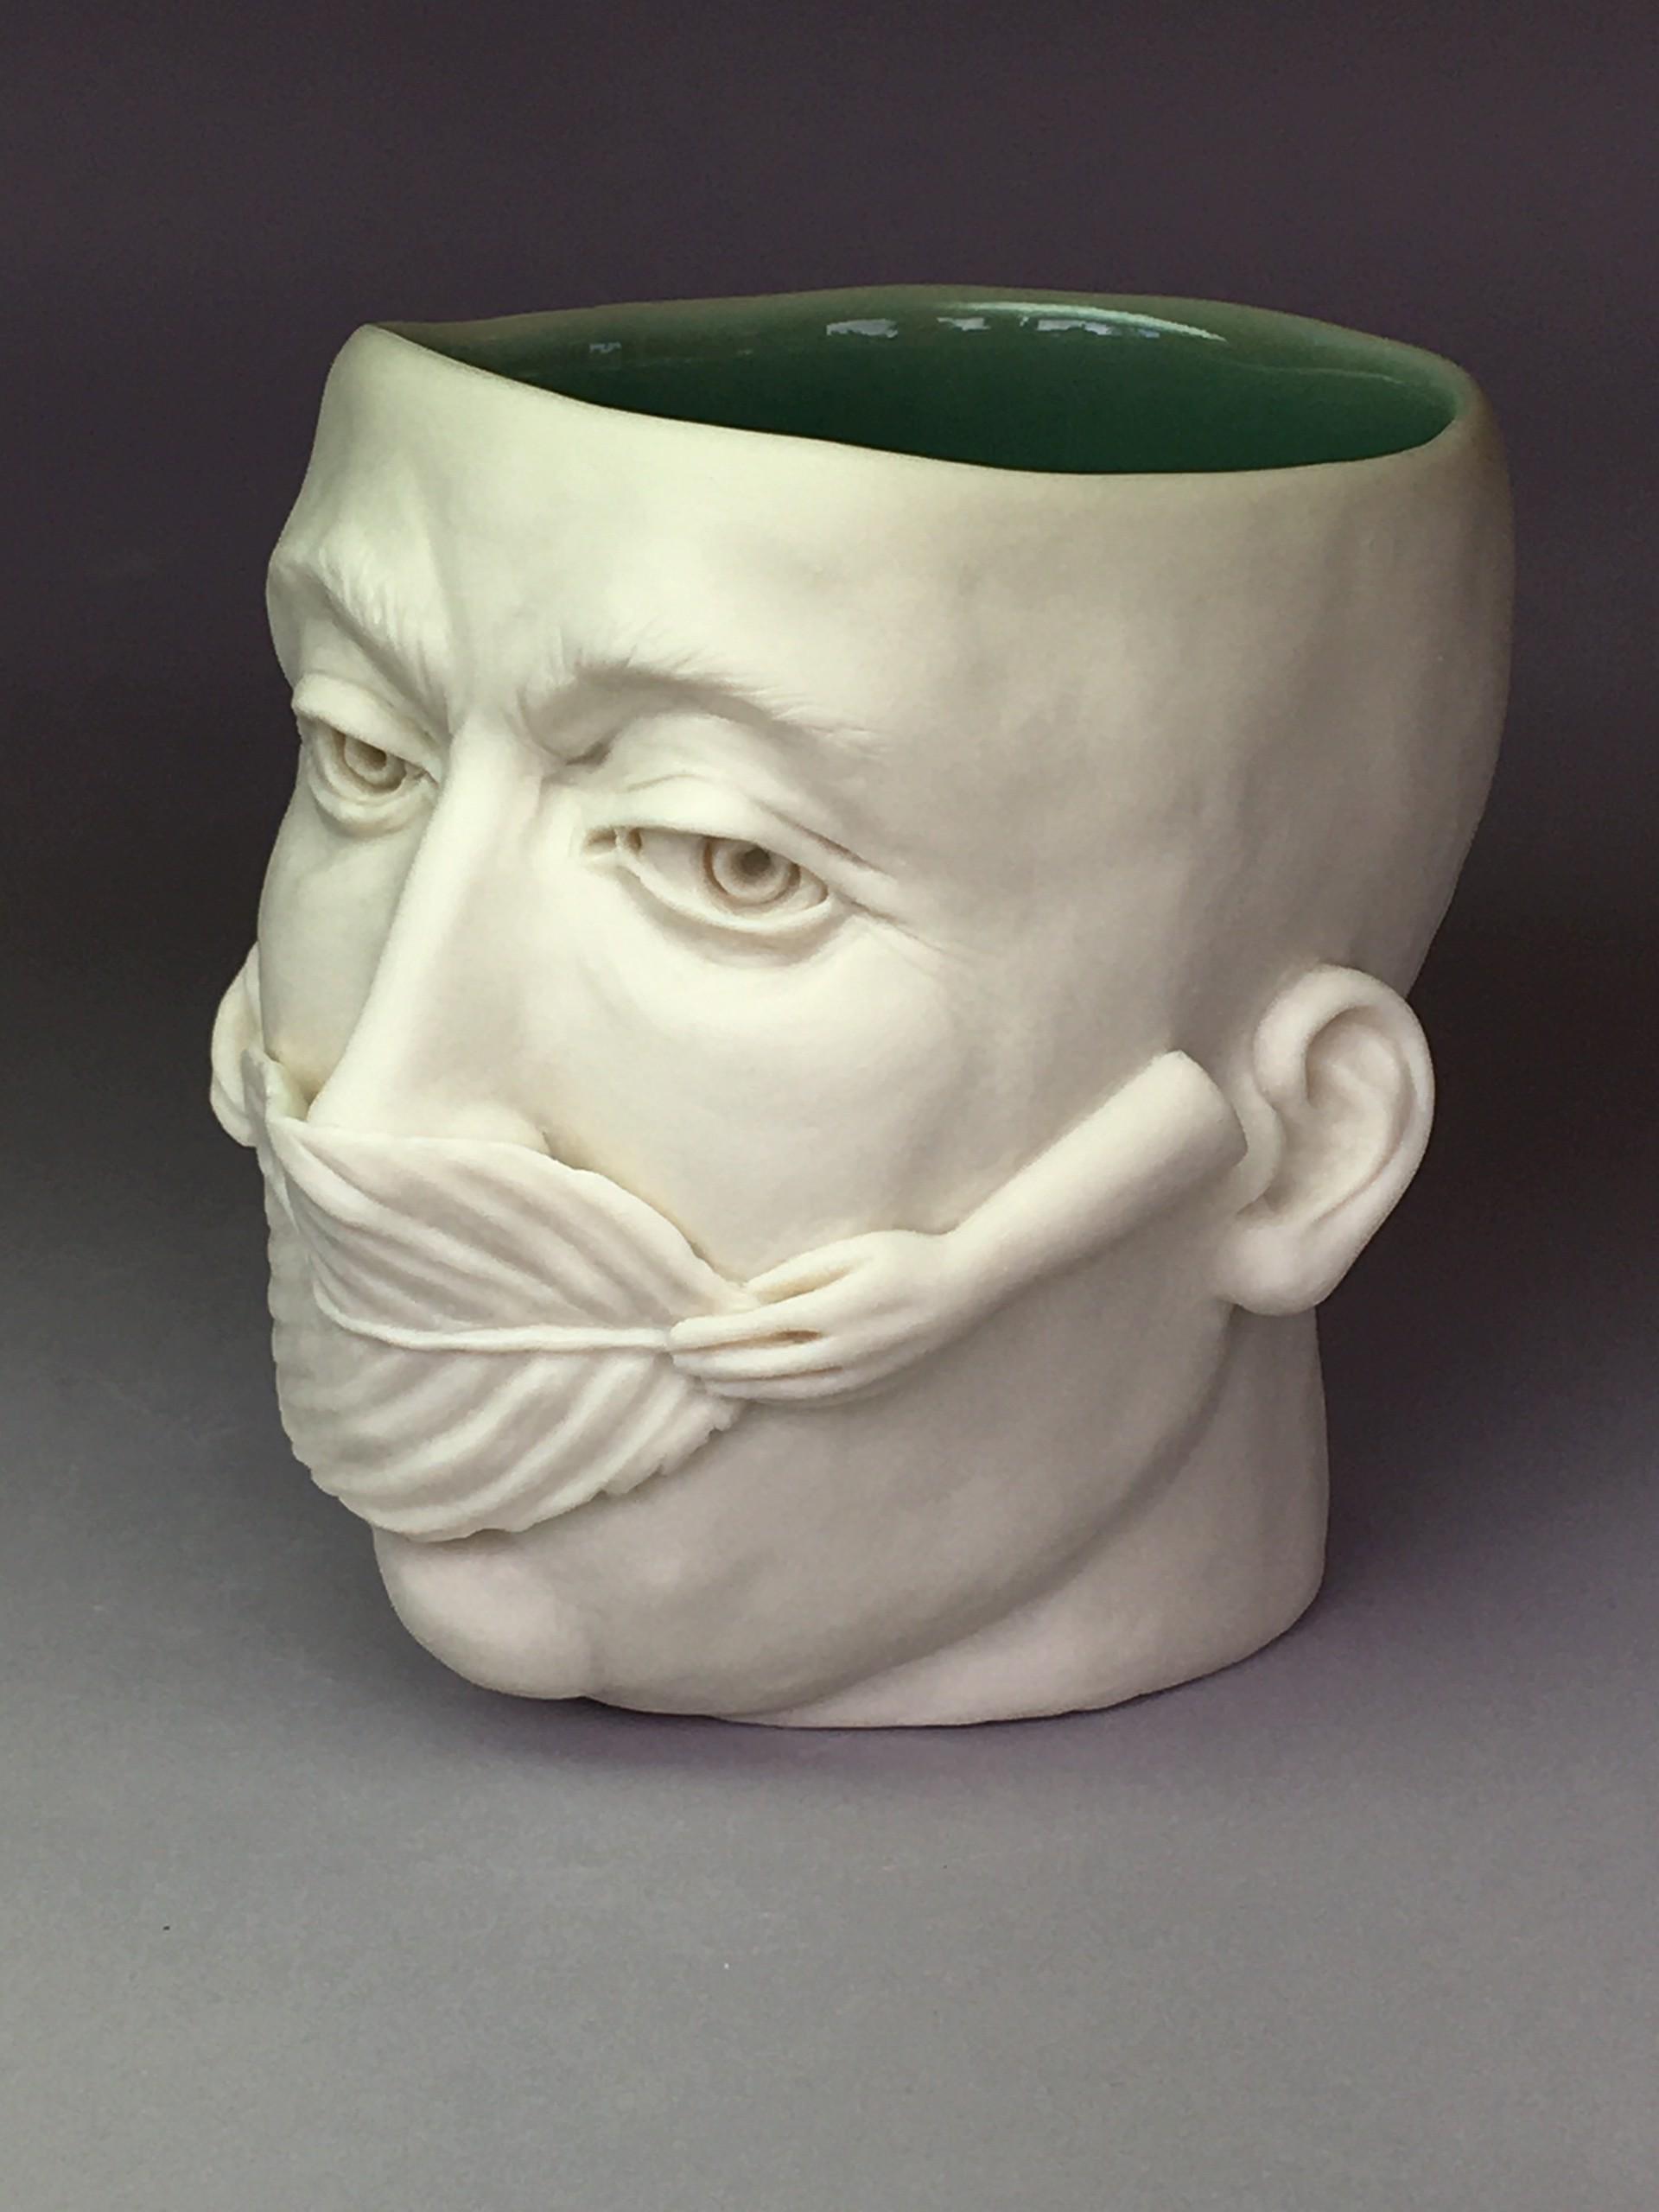 """Leaf Mask, Earth Day III, 2020"" (eyes open) by Adrian Arleo"